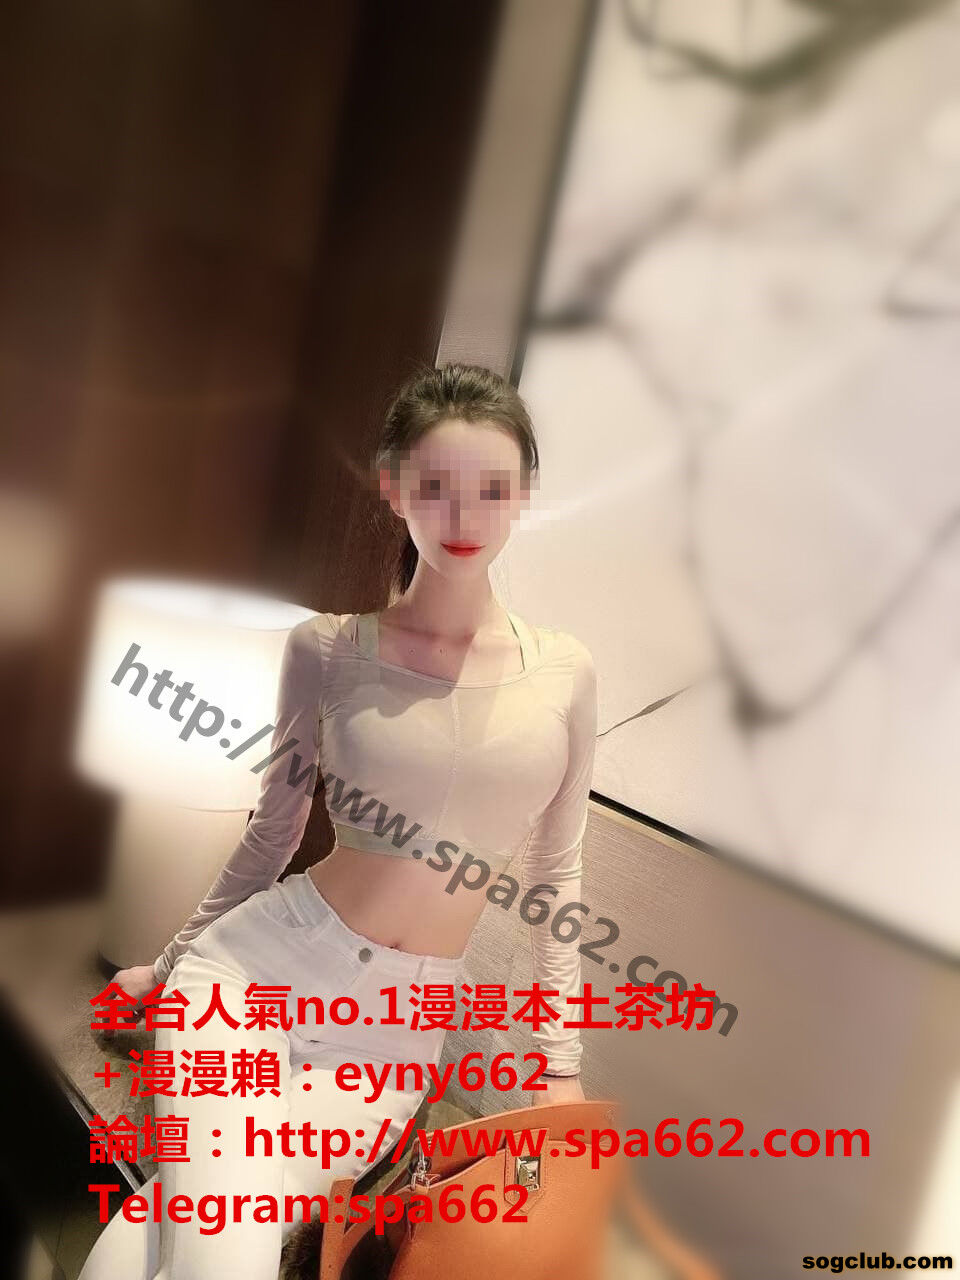 photo_2021-02-28_21-40-29.jpg